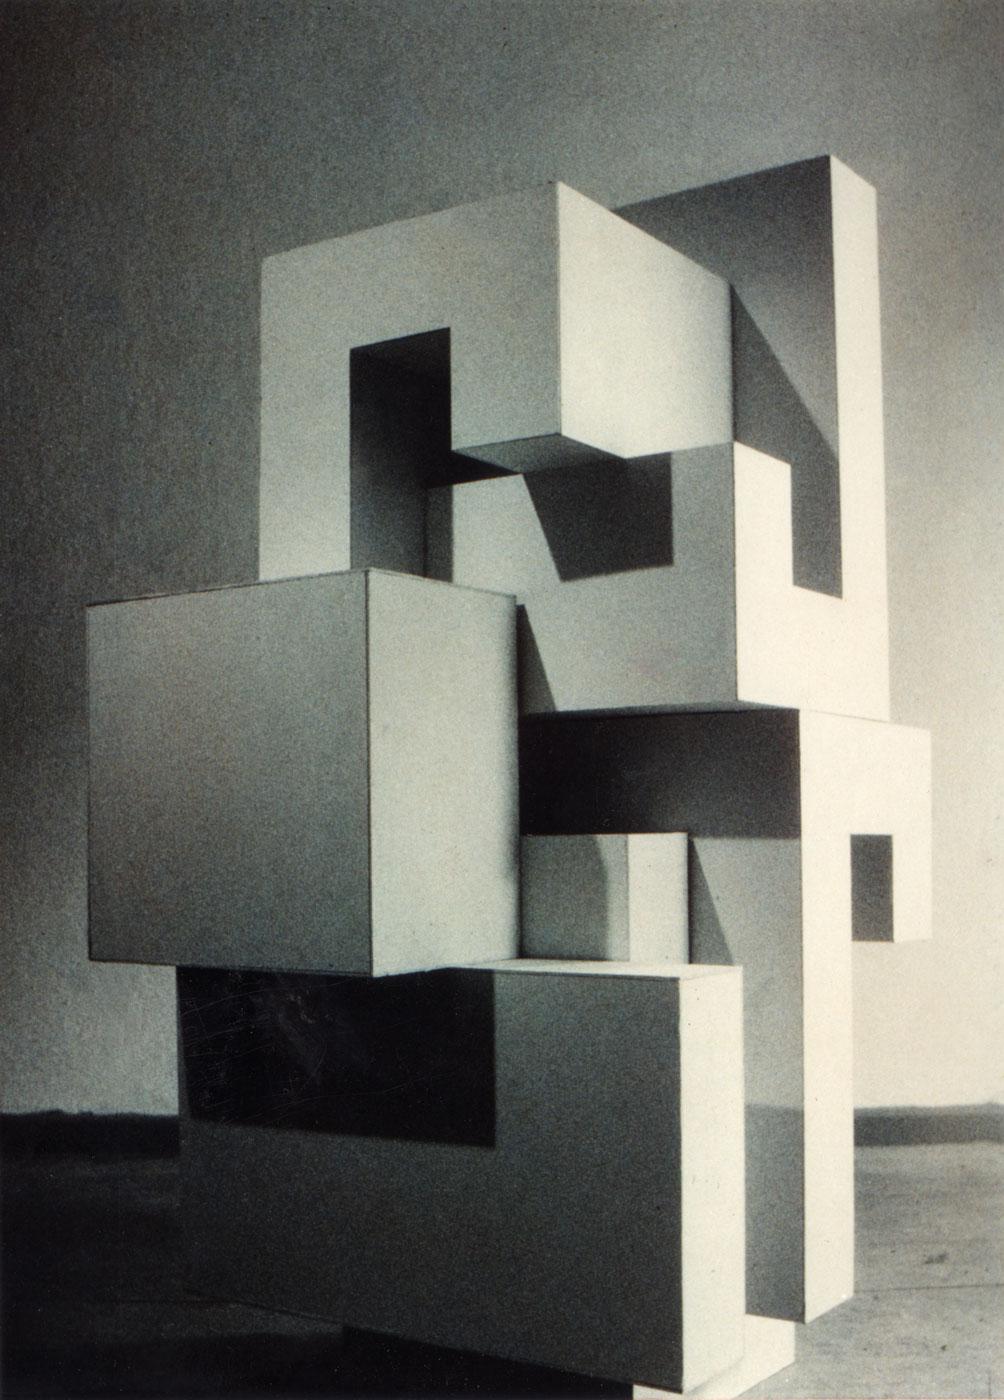 CARDBOARD MODUL I,  © 1992, cardboard, 120 x 50 x 50 cm